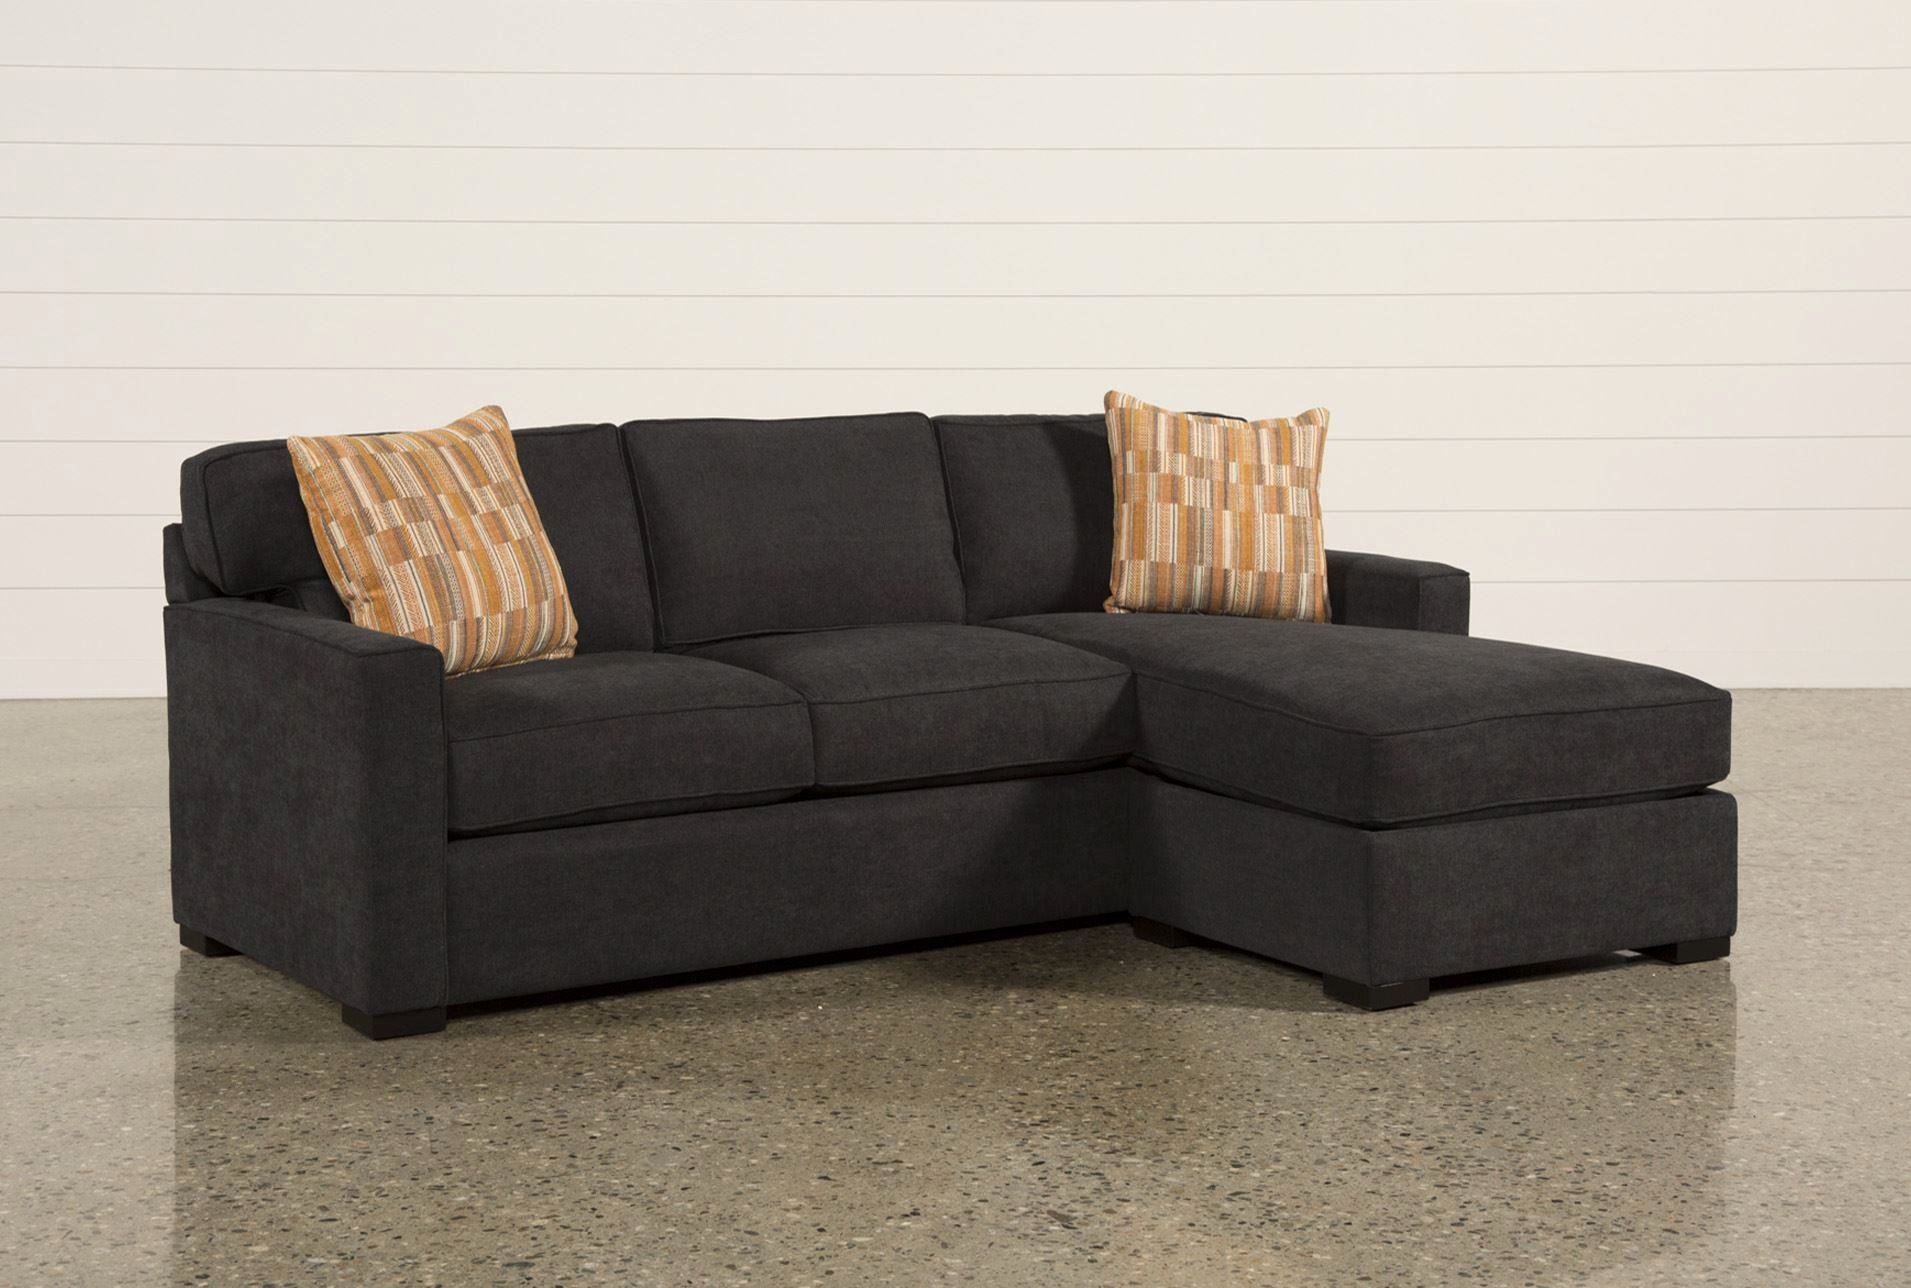 Amazing Sleeper Chaise Sofa Photograpy Taren Reversible Sofa